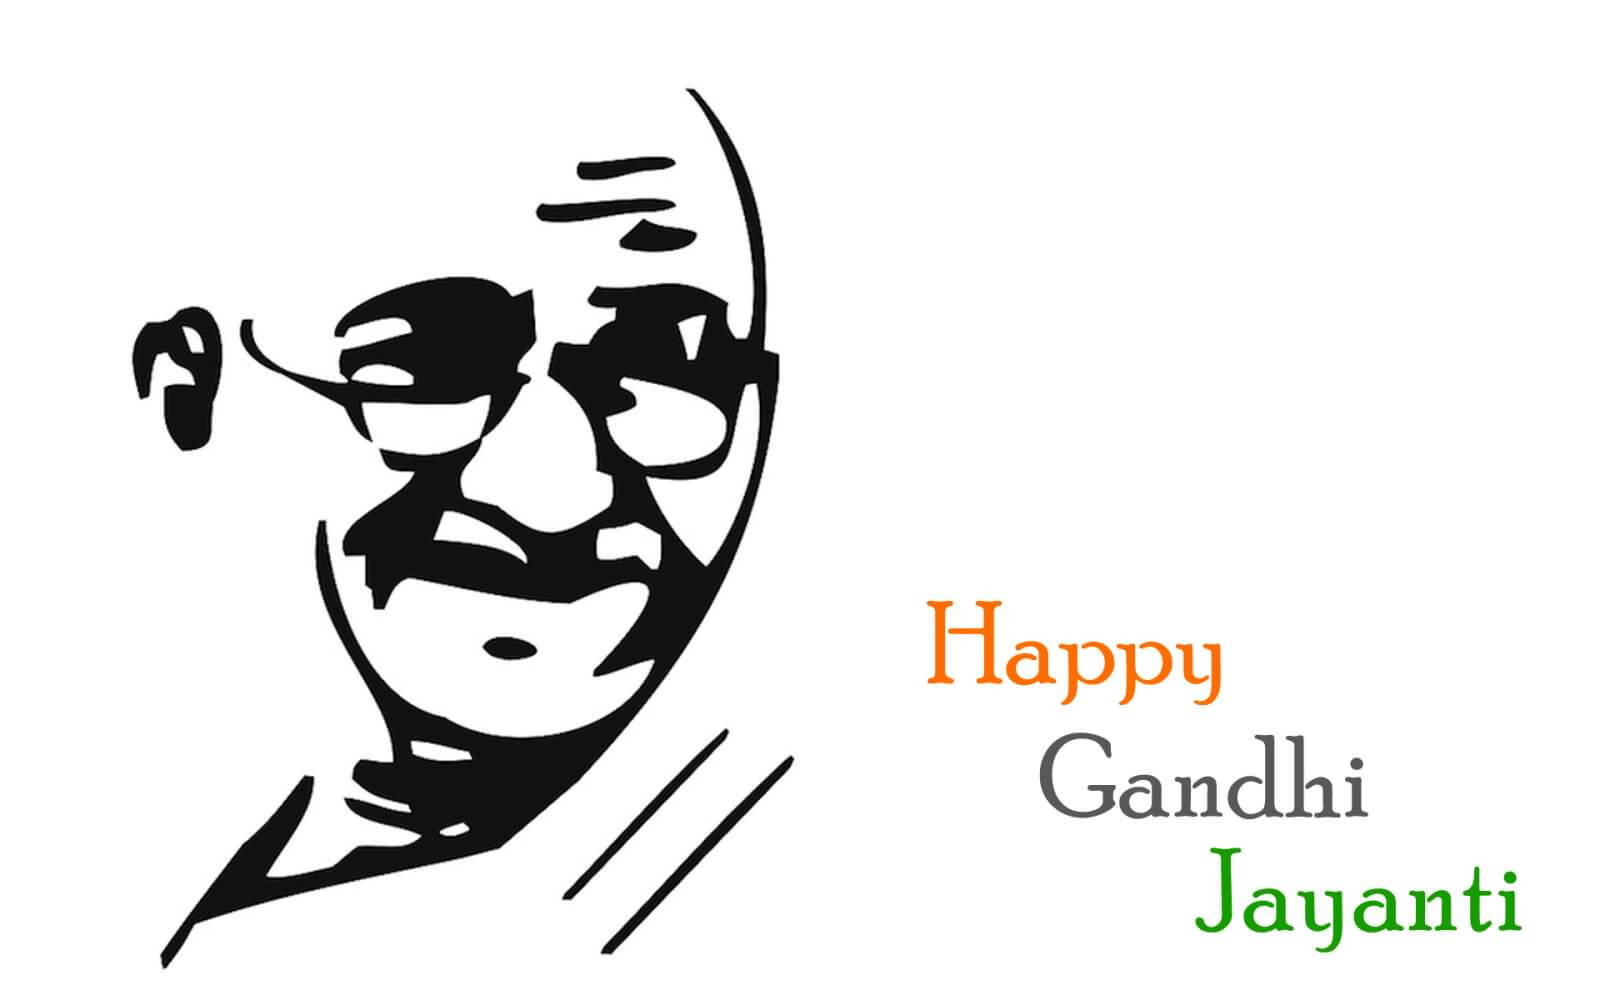 happy gandhi jayanti october 2 silhouette hd wallpaper